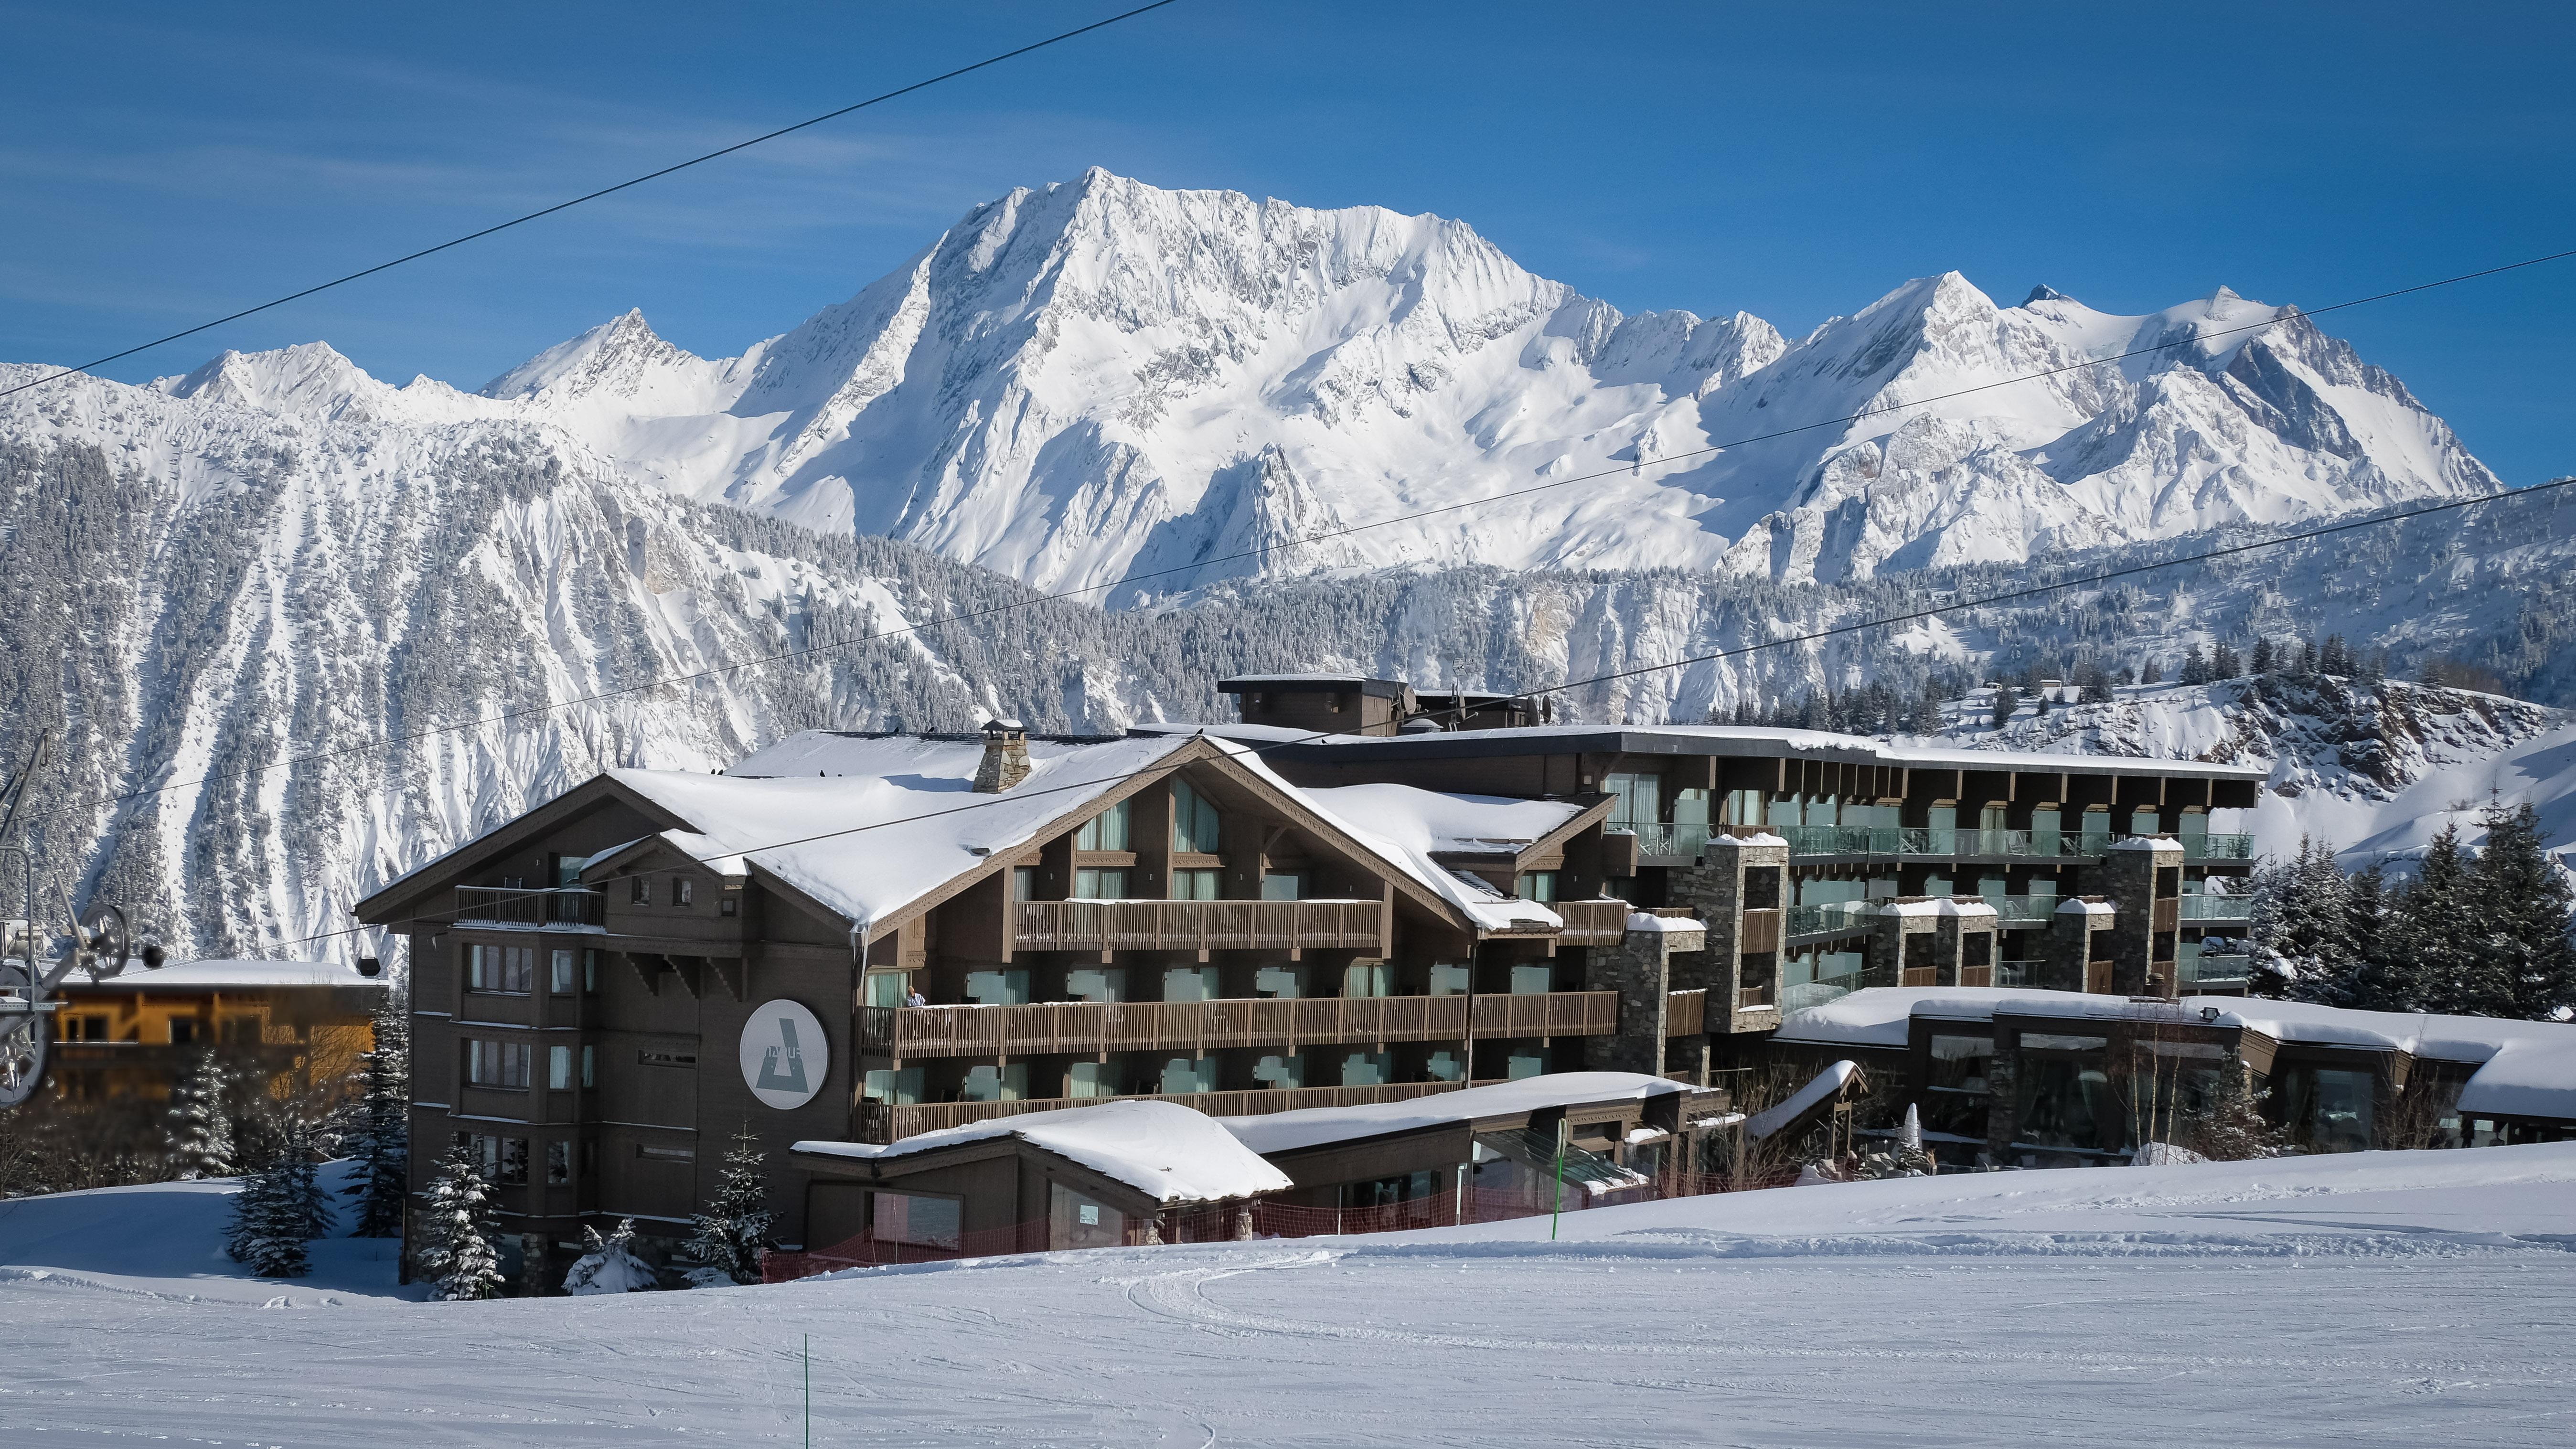 горы куршевель картинки фото балкон светлых